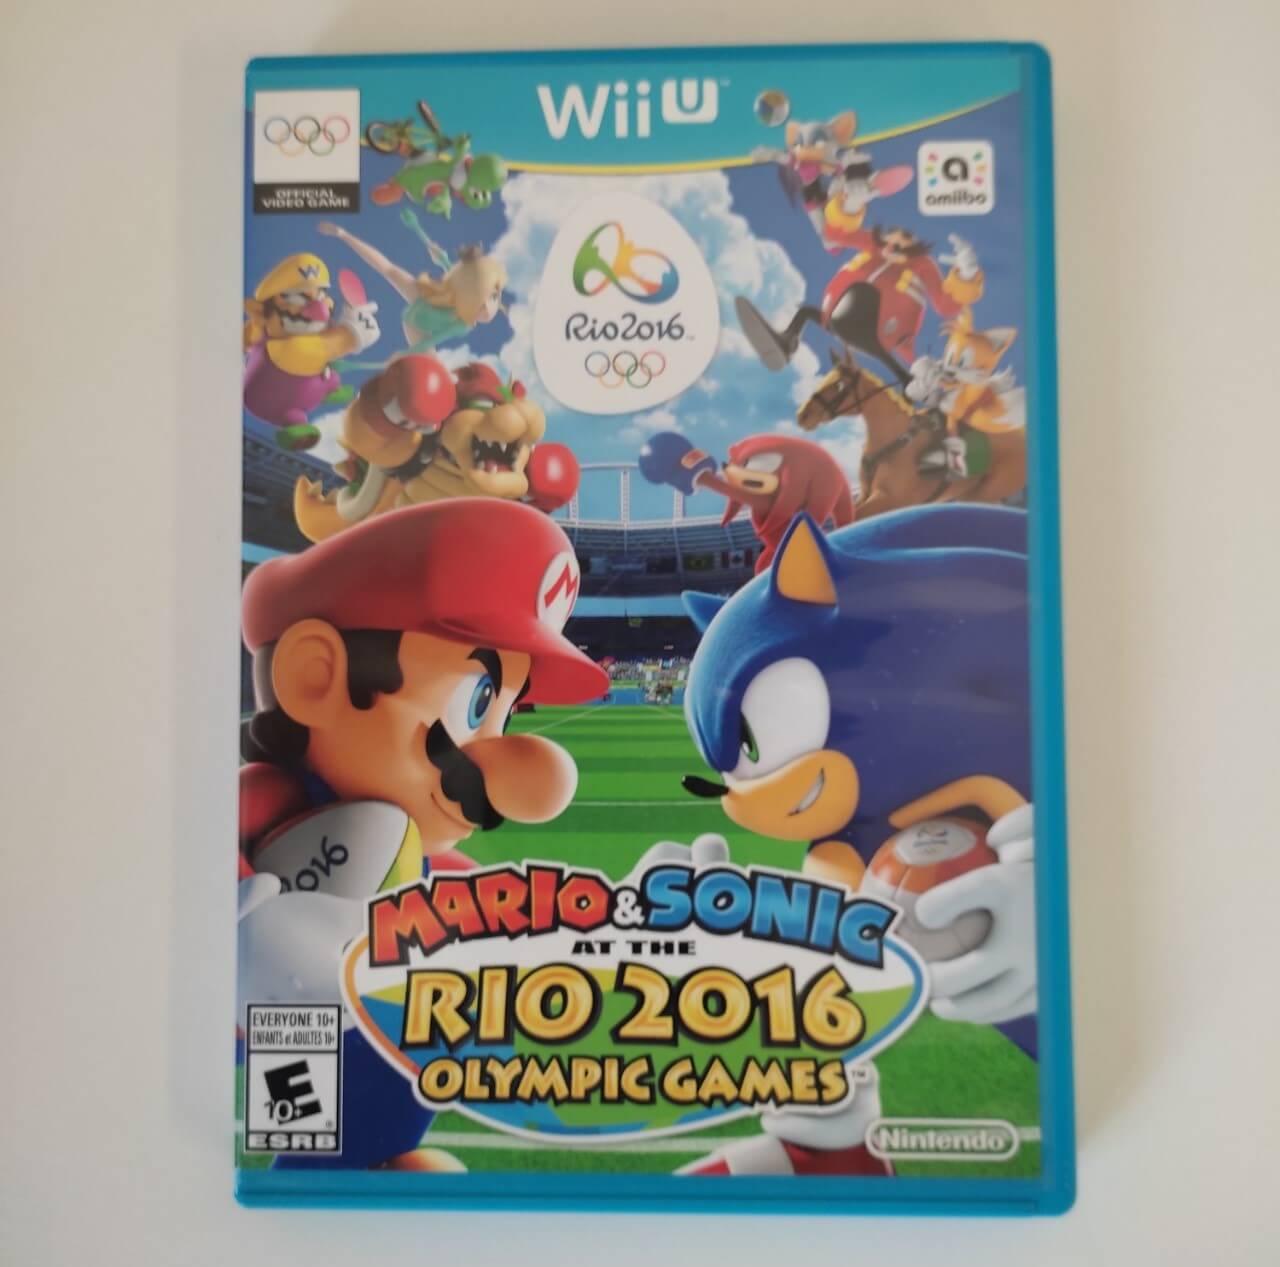 Mario & Sonic at the Rio 2016 Olyimpic Games - Nintendo Wii U - Usado